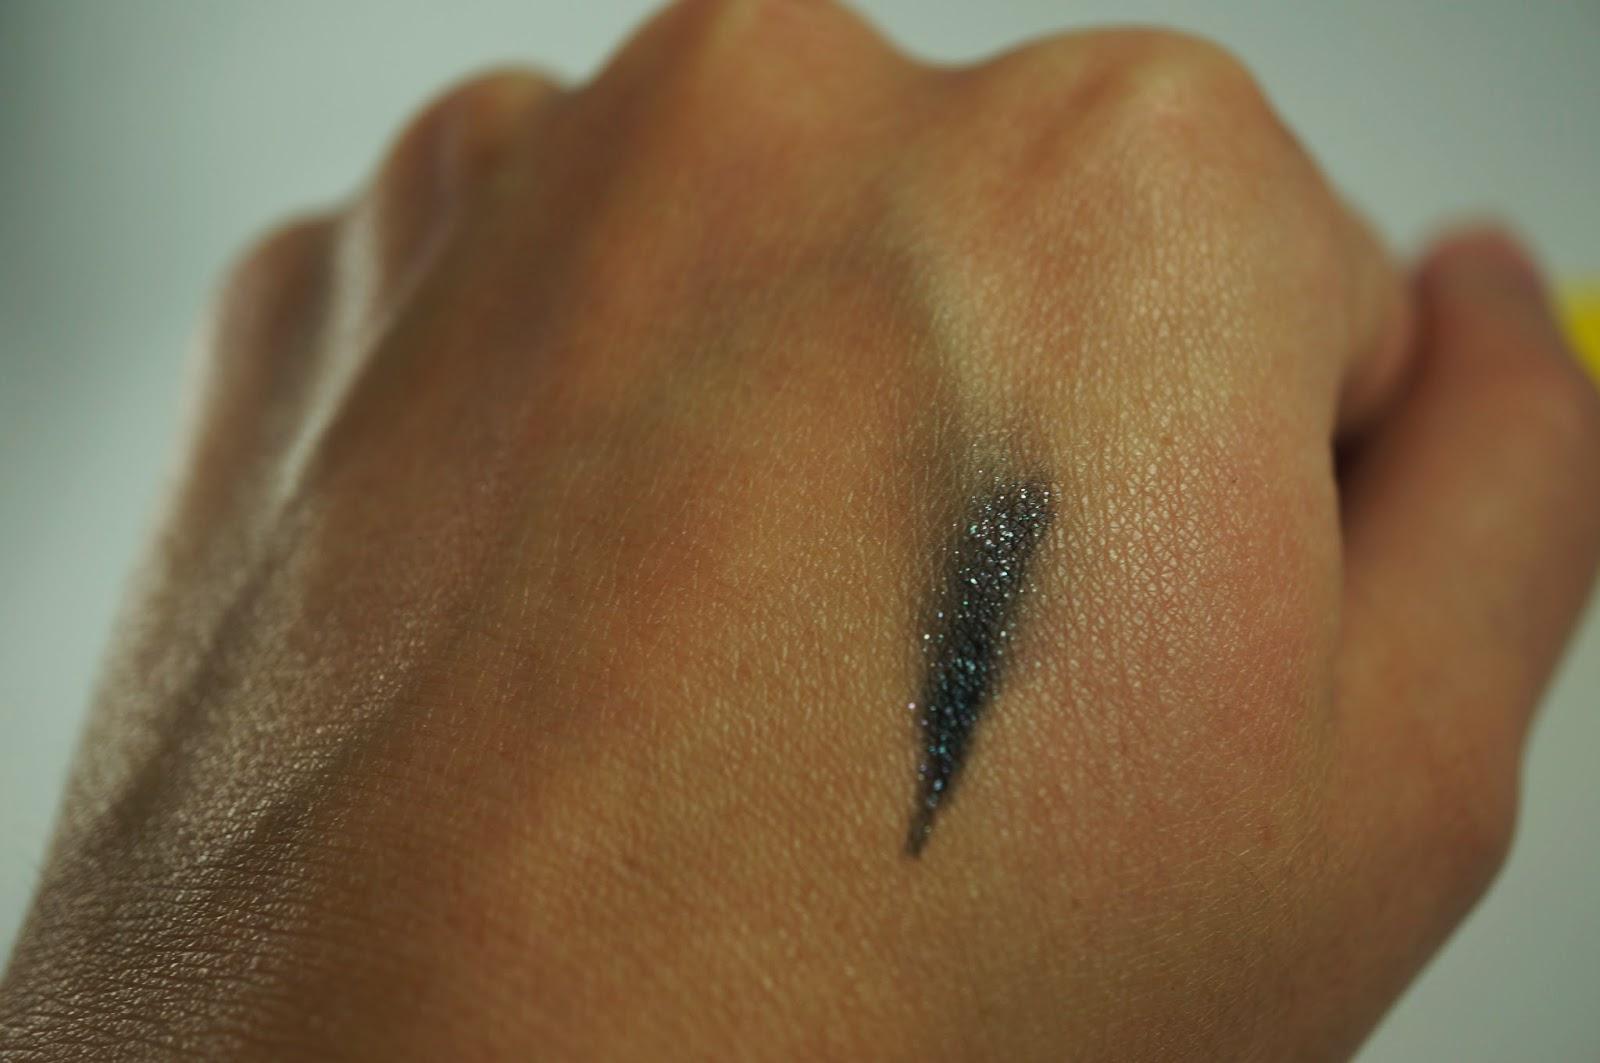 Memebox #25 Traveller's Traveler's Beauty Kit Unboxing Review ideeB Sweet Jelish Eyeliner Ultra Fine Pearl Black Swatch